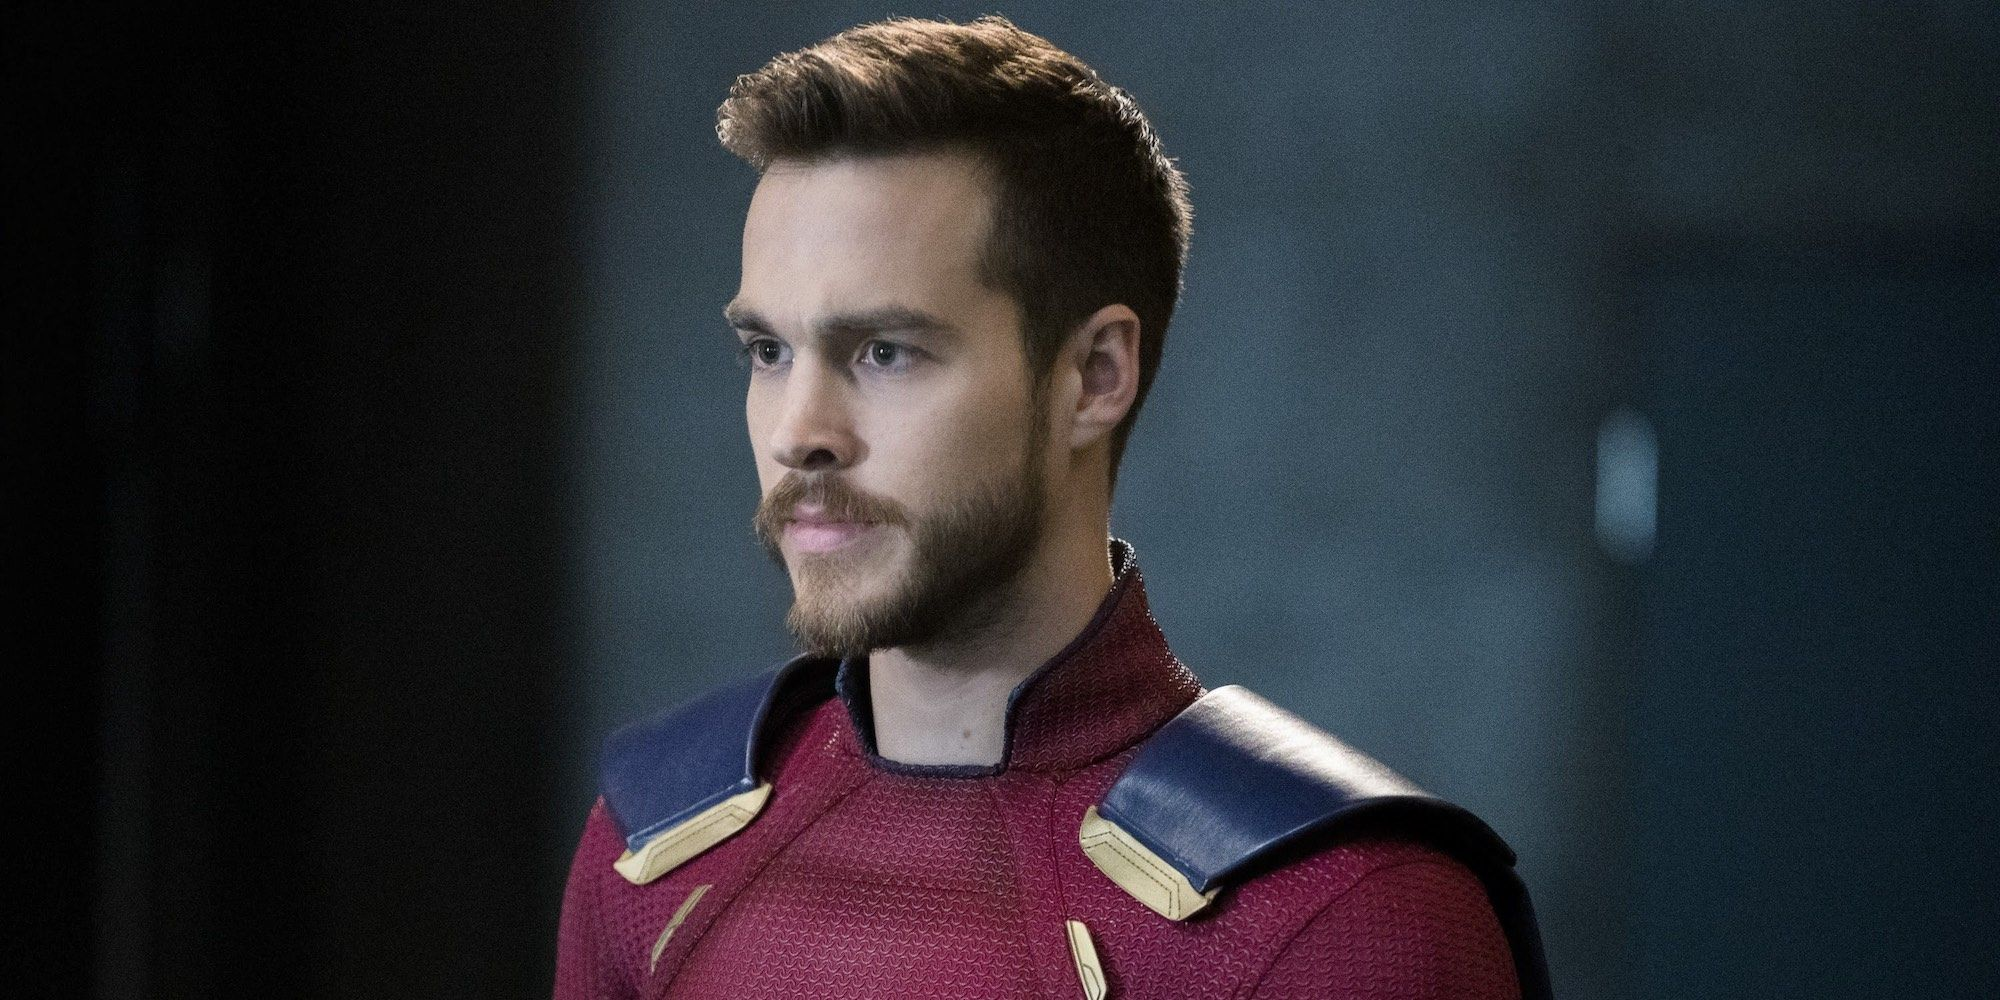 Supergirl Season 4: Mon-El Actor Chris Wood Won't Return